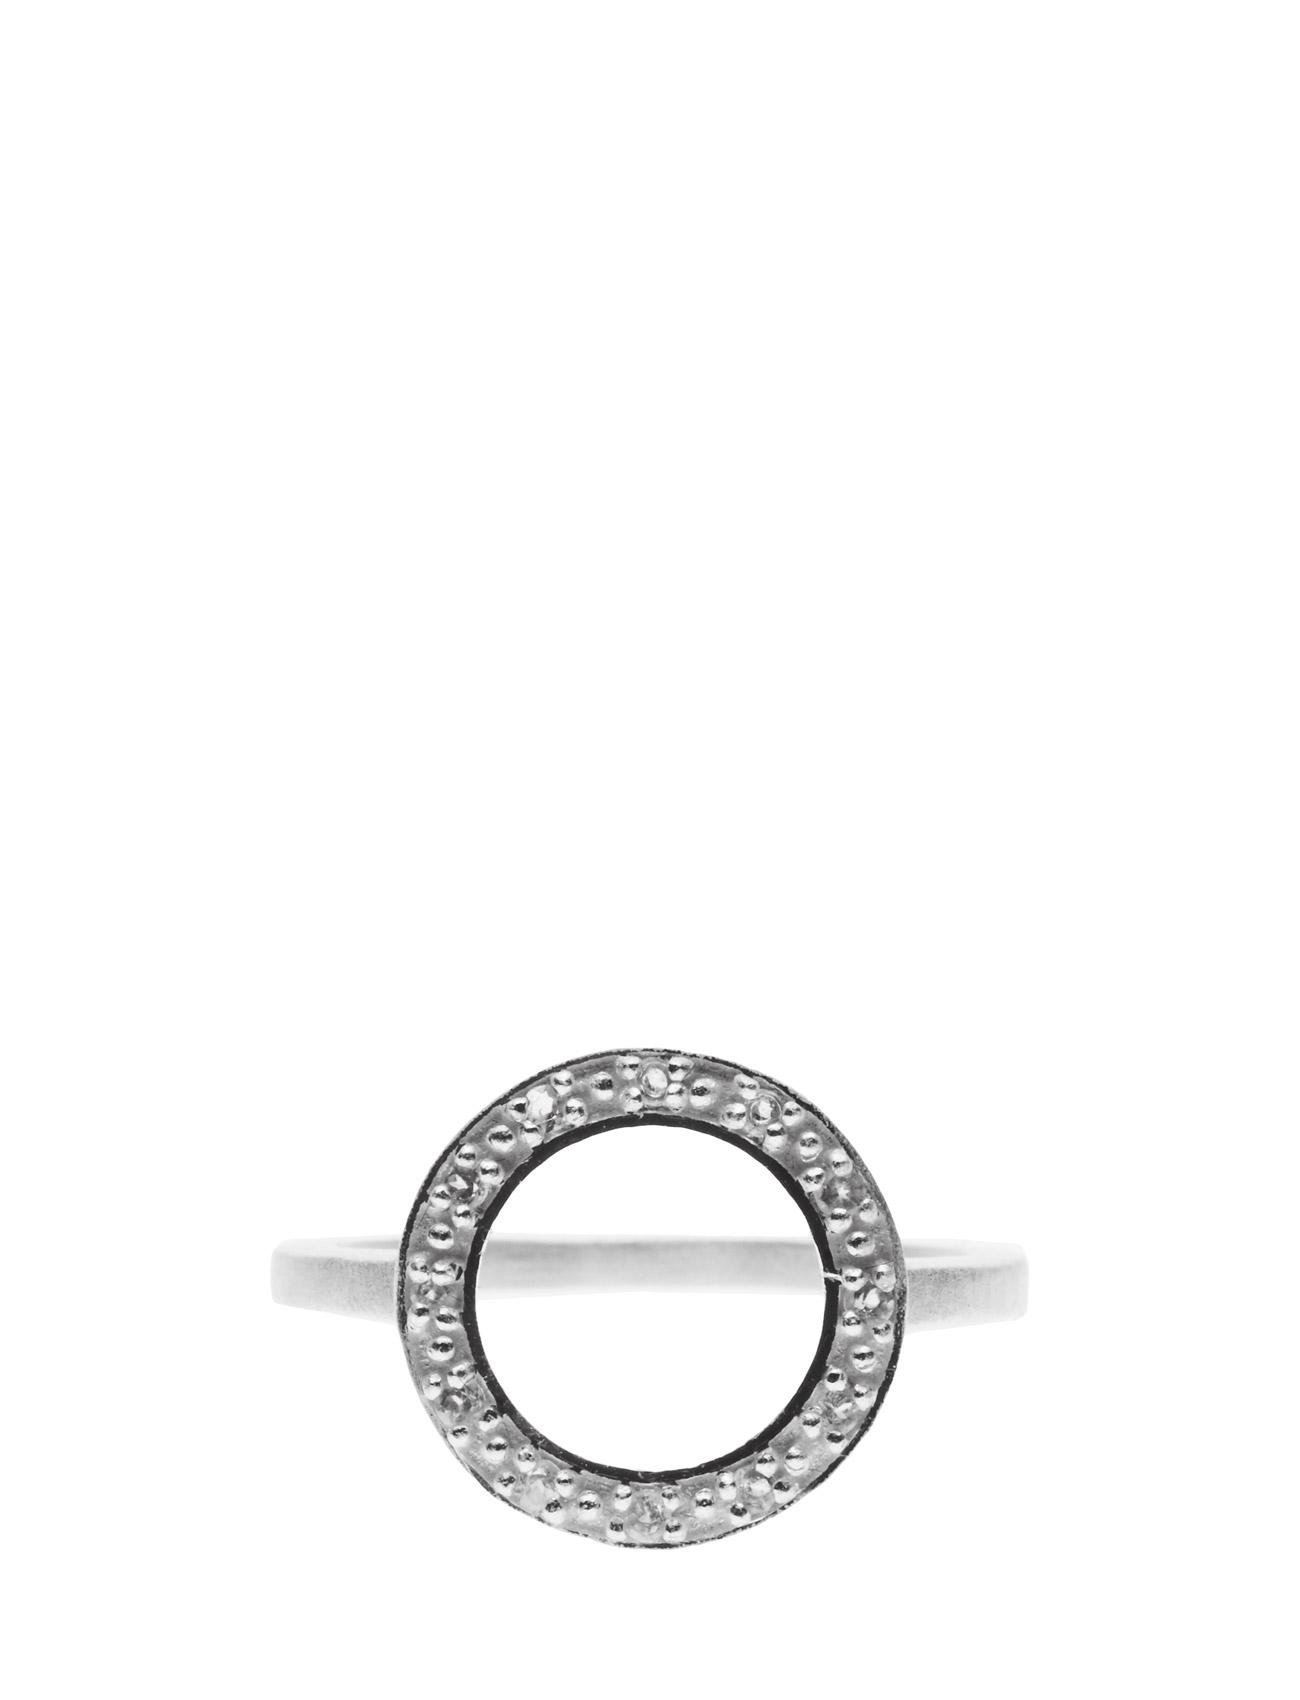 Ring Halo - Jewlscph